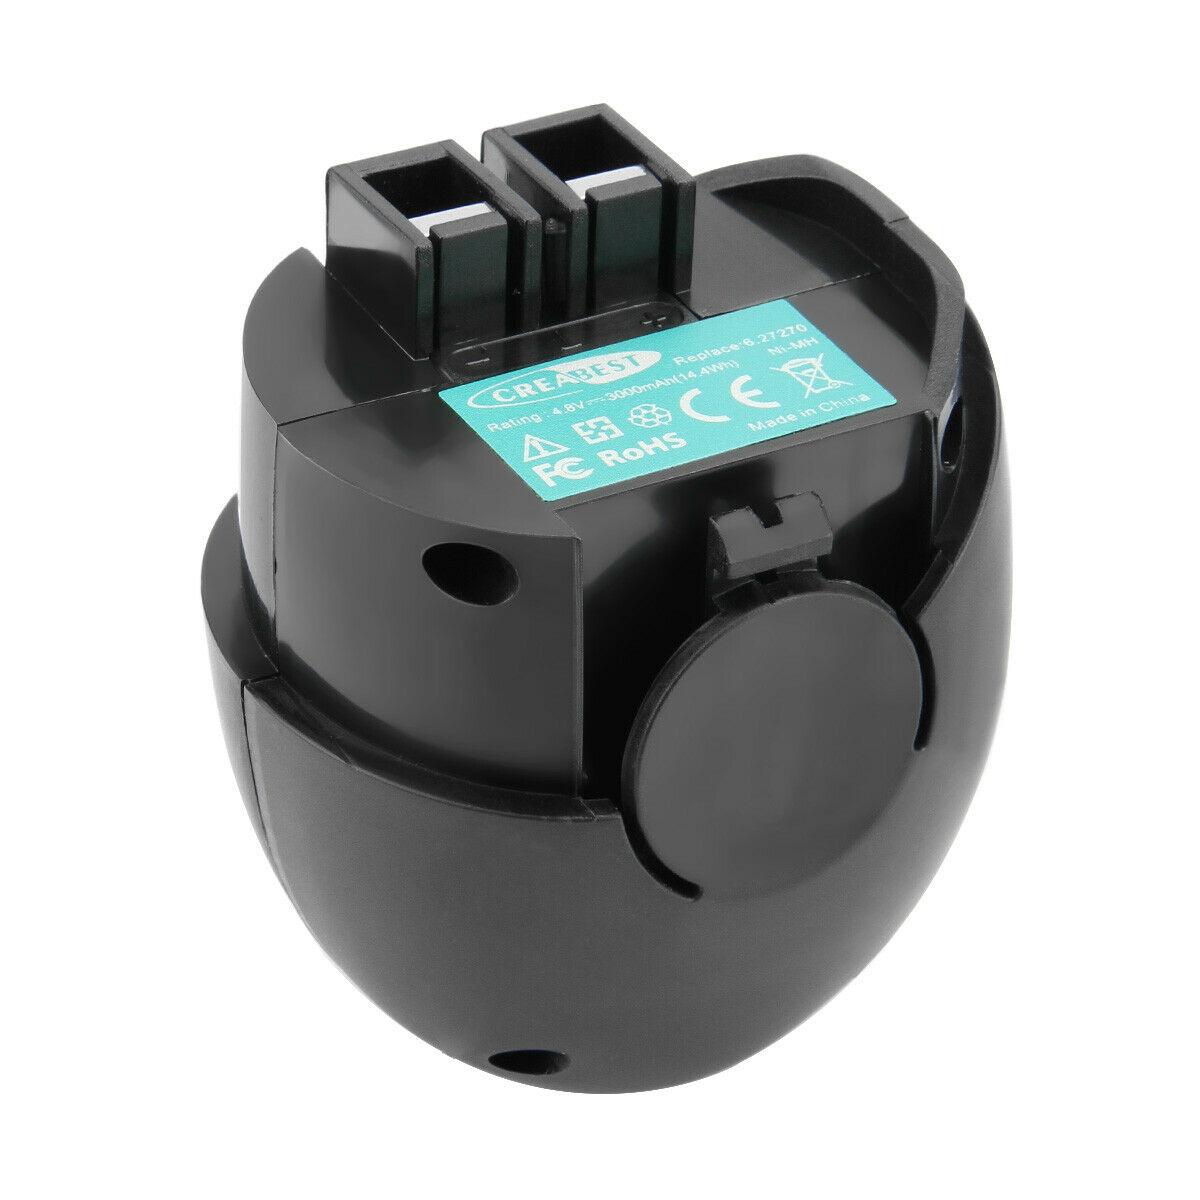 4.8V 3.0AH Ni-MH Metabo Powergrip 2 II Flashlight Powermaxx 6.27270 compatible Battery